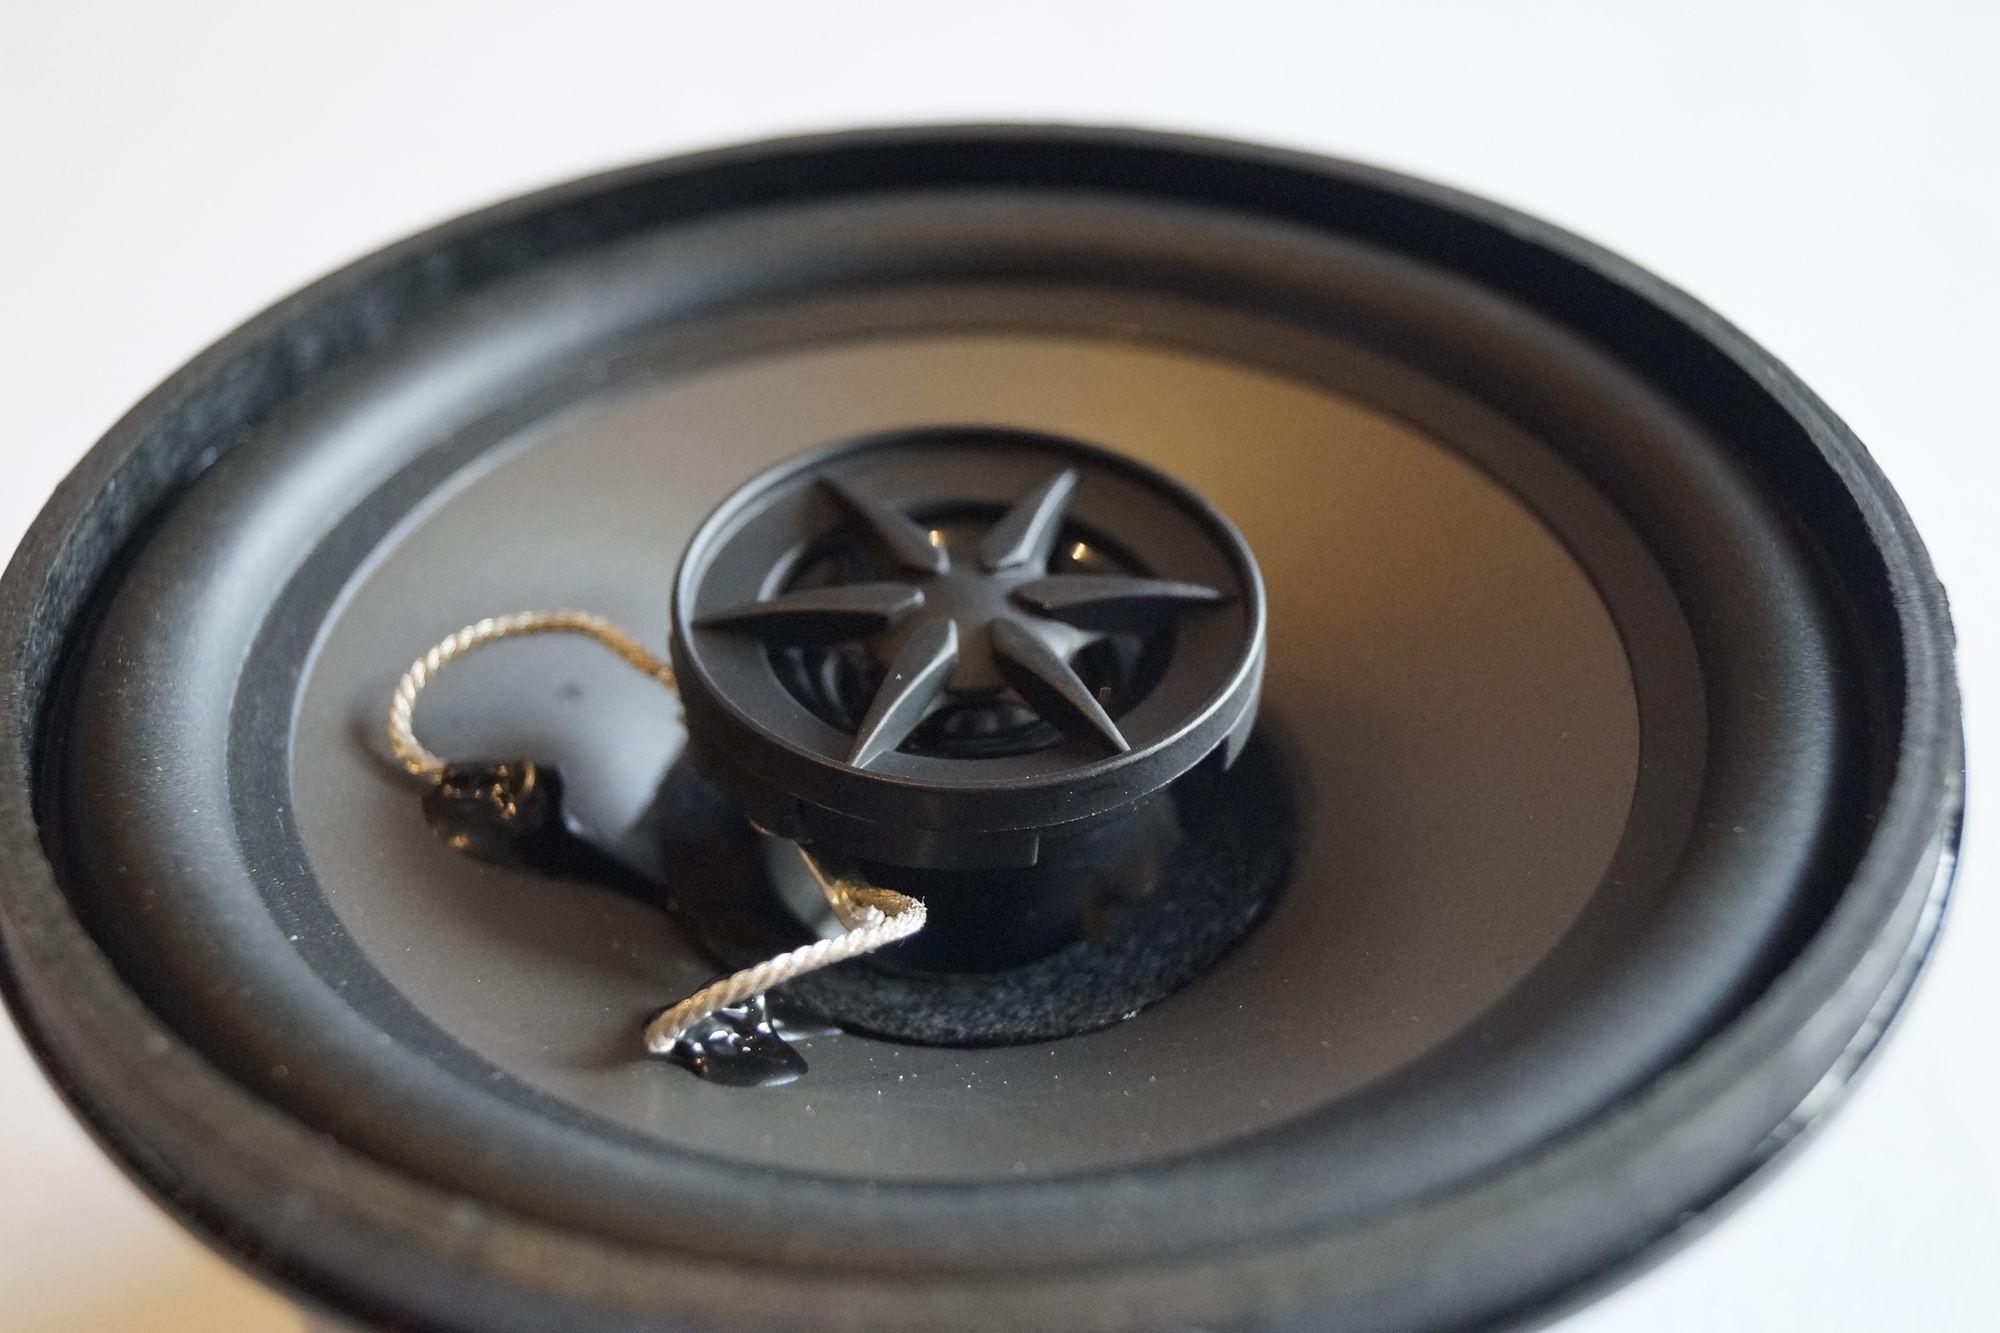 Mercedes Benz W 124 2 Wege Lautsprecher Front Armaturenbrett PG Audio 1 Paar  – Bild 3